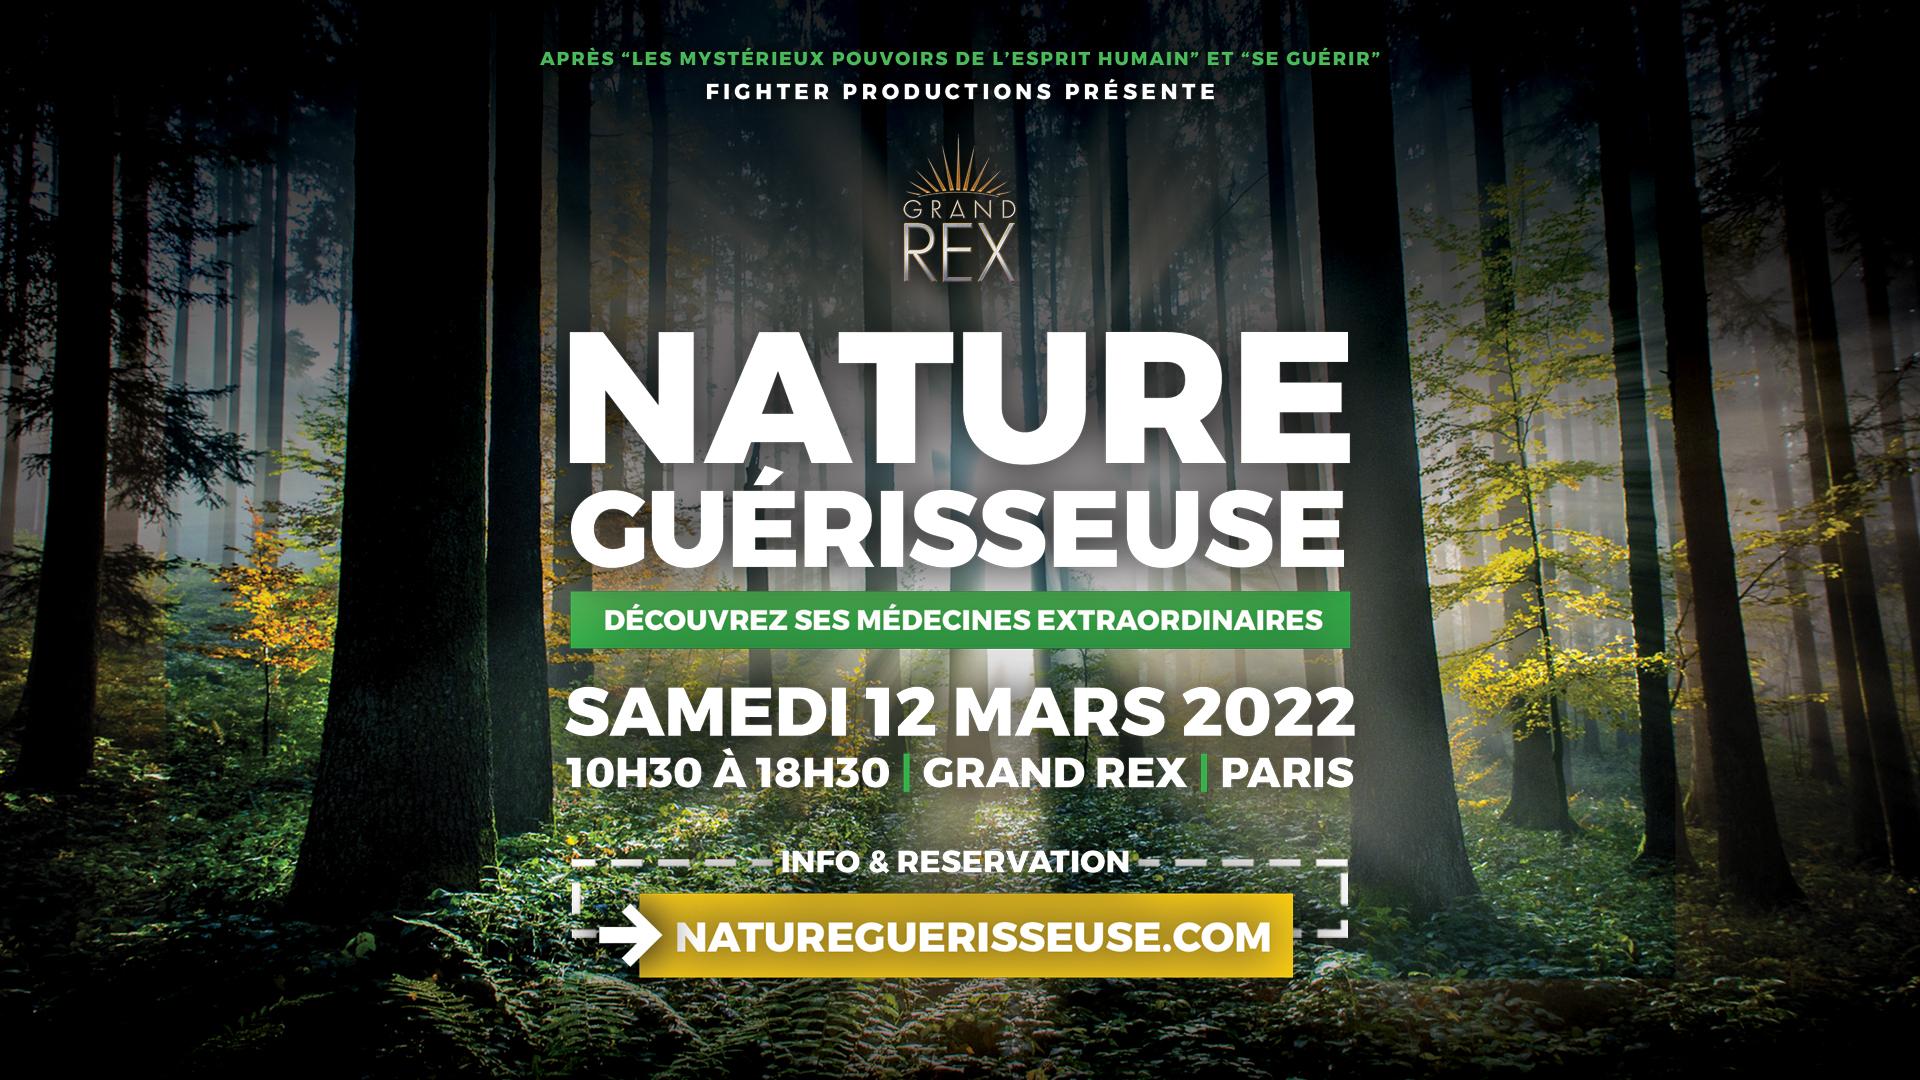 nature-guerisseuse-samedi-22-mars-2022-affiche